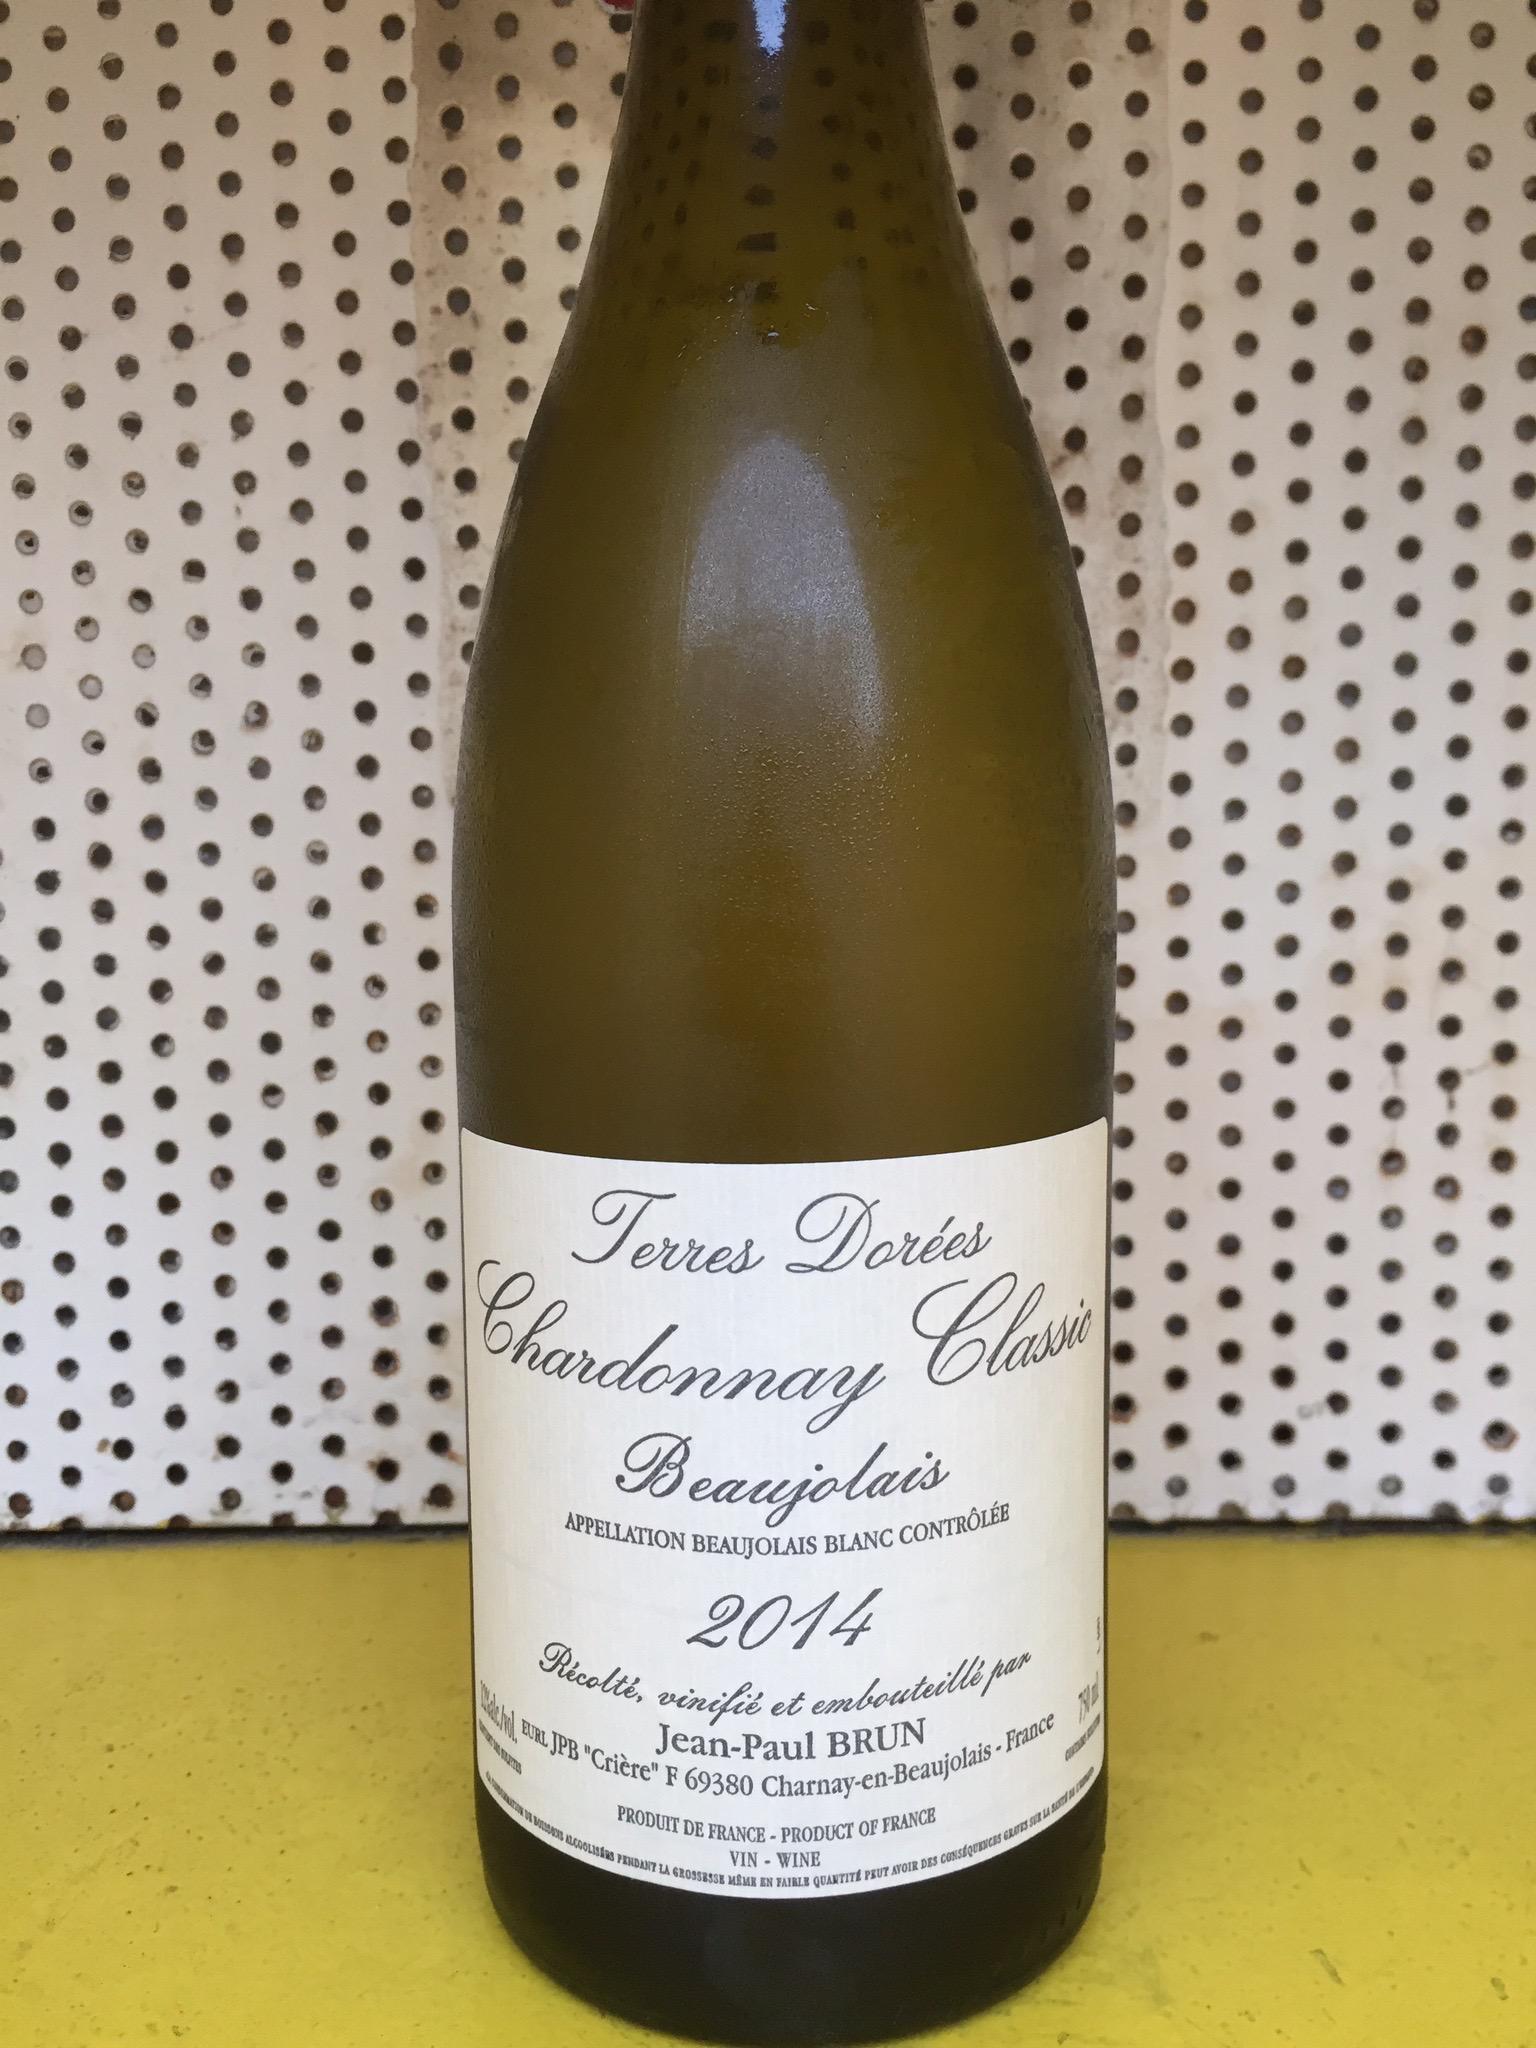 Beaujolais/Terres Dorées/ Brun/ Chardonnay Classic